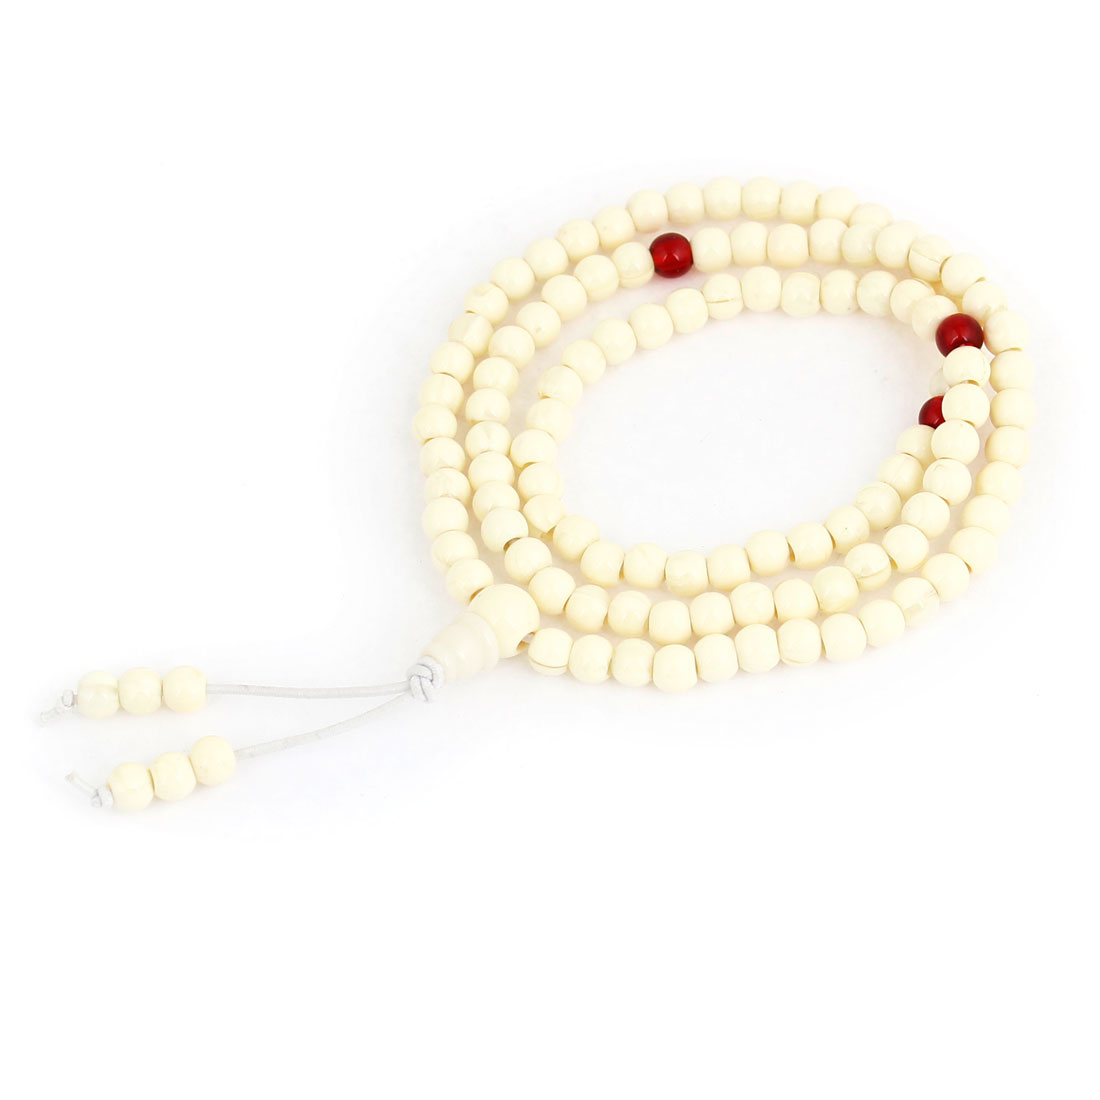 Lady Ivory Plastic Beads Stretch Bracelet Hand Catenary Ornament Jewelry Gift